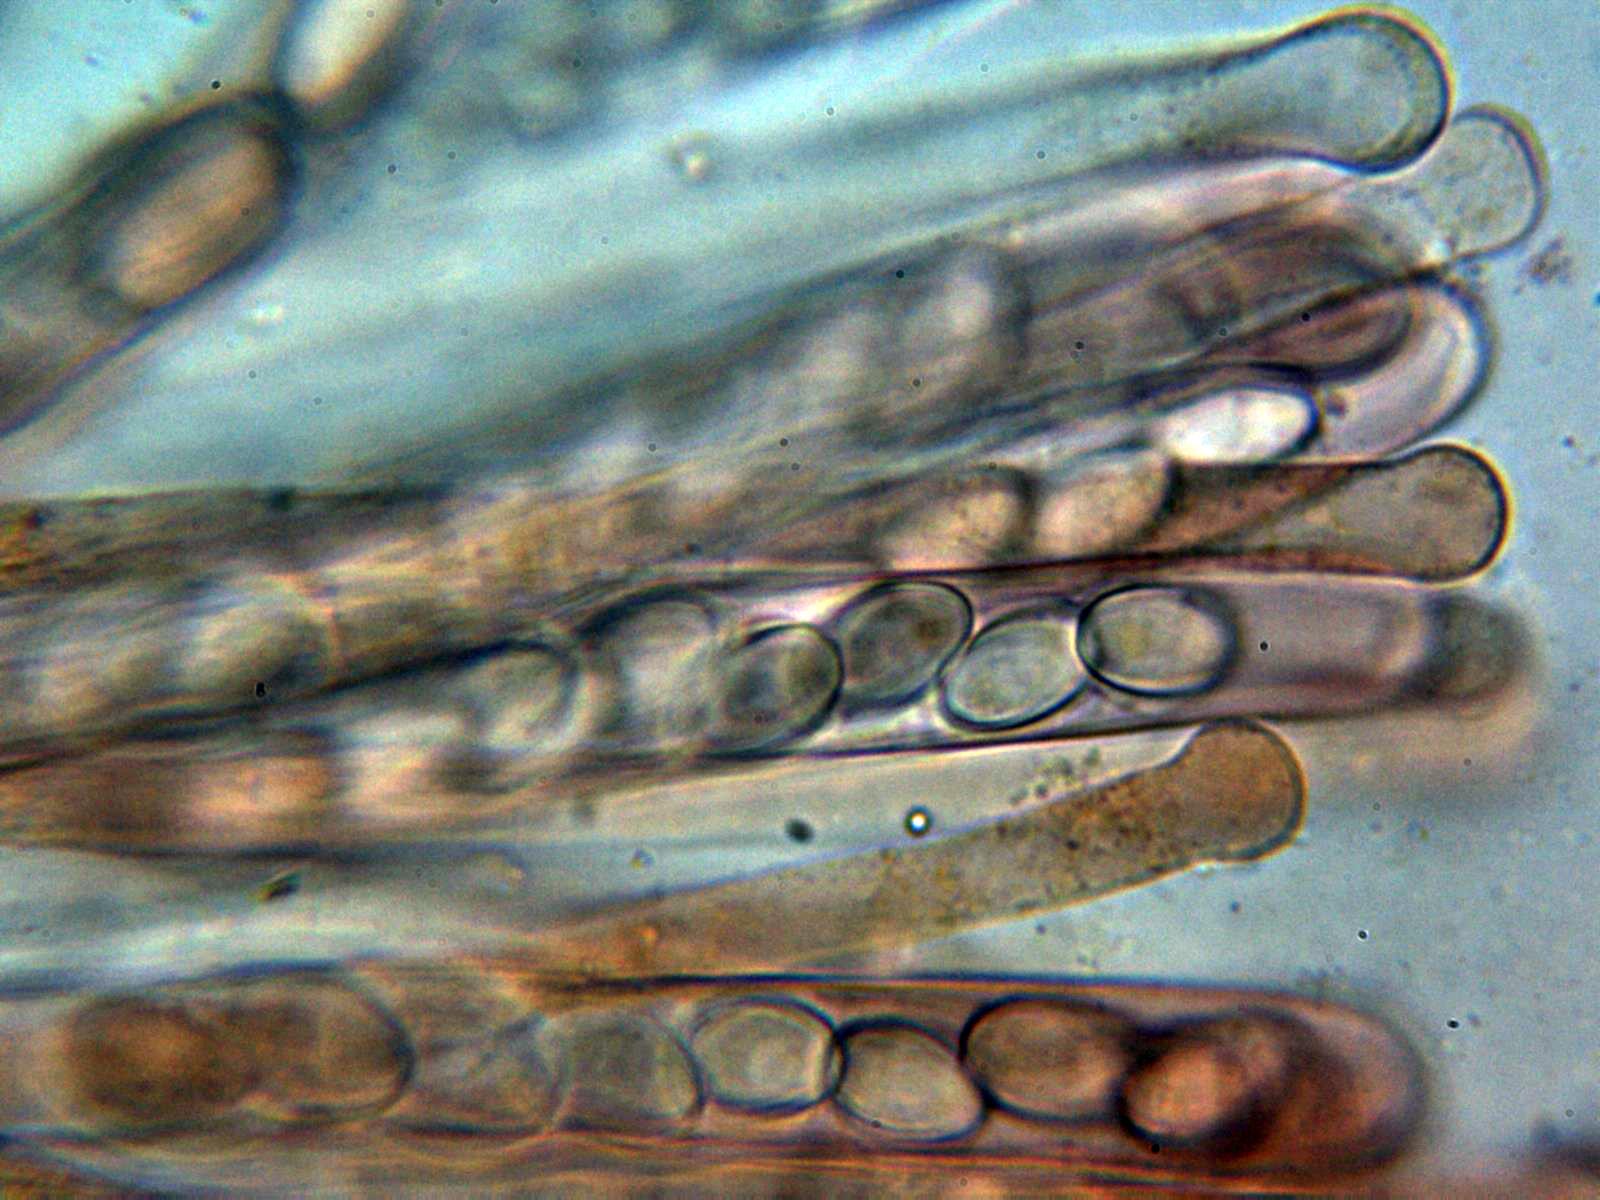 Ascosyparfisis2_2021-06-30.jpg